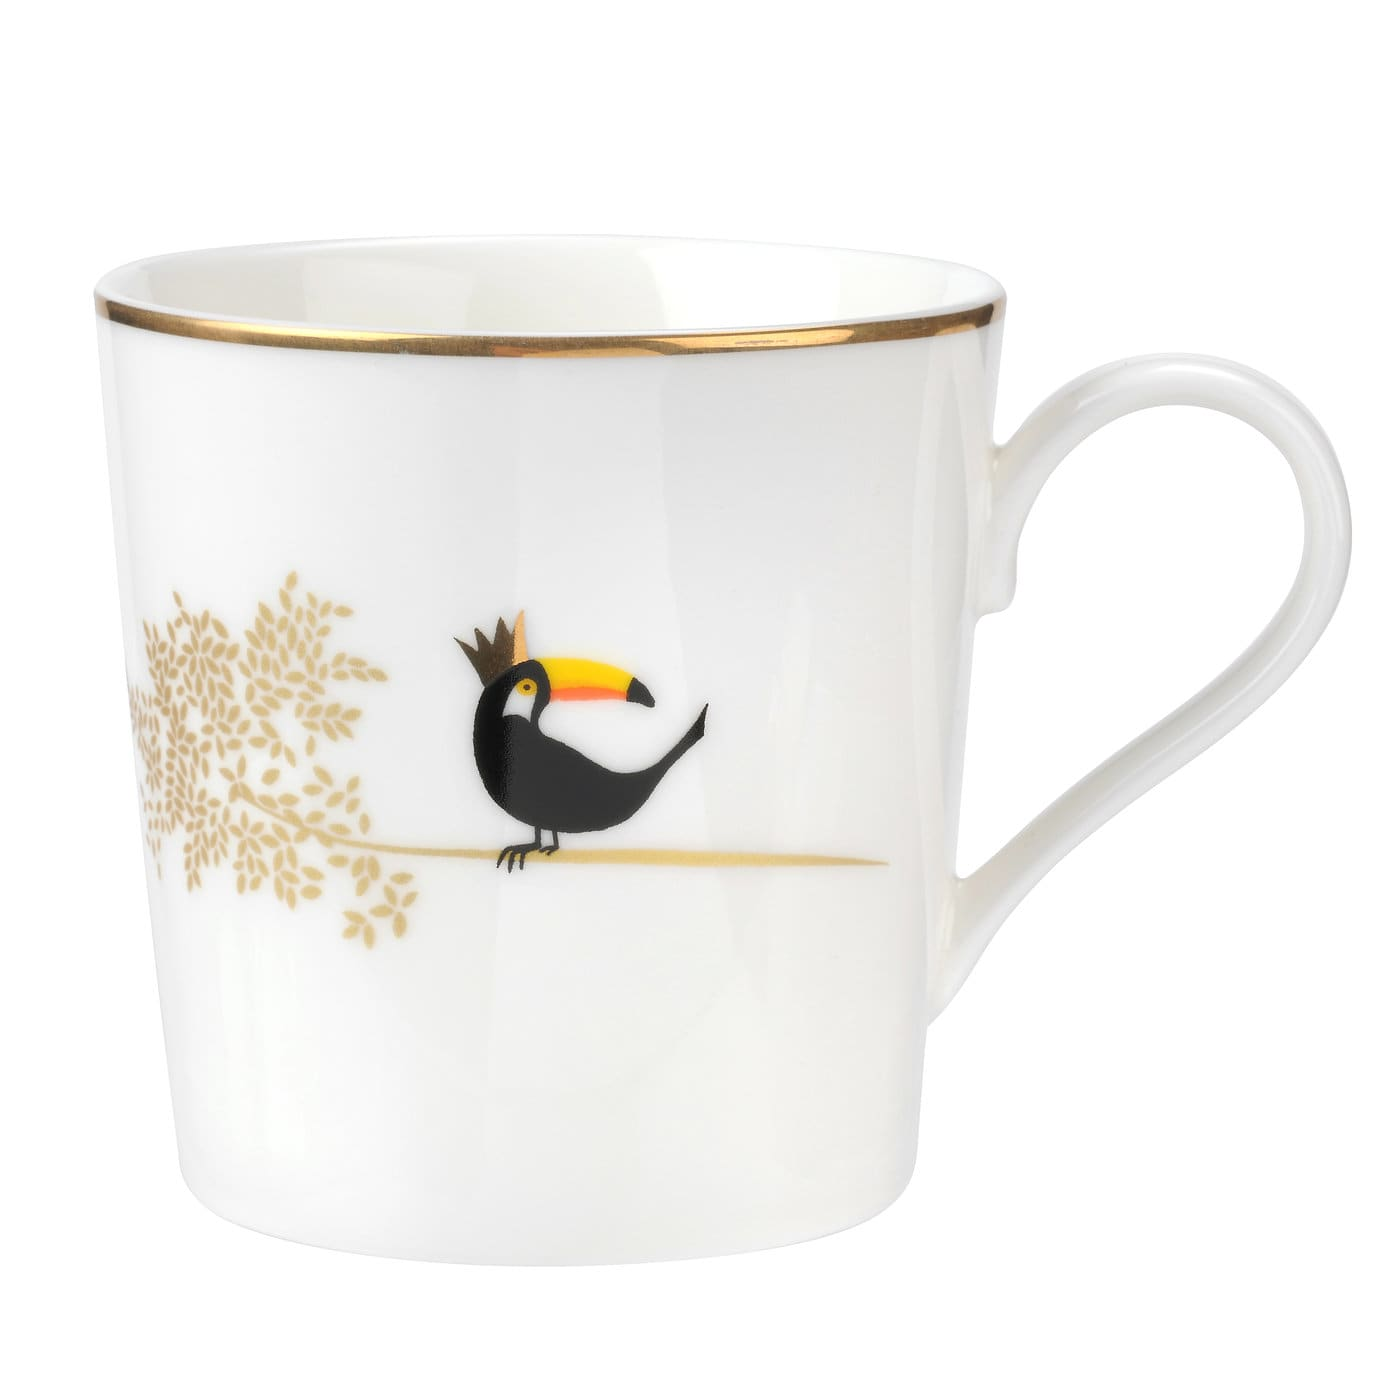 Portmeirion Piccadilly Terrific Toucan Mug